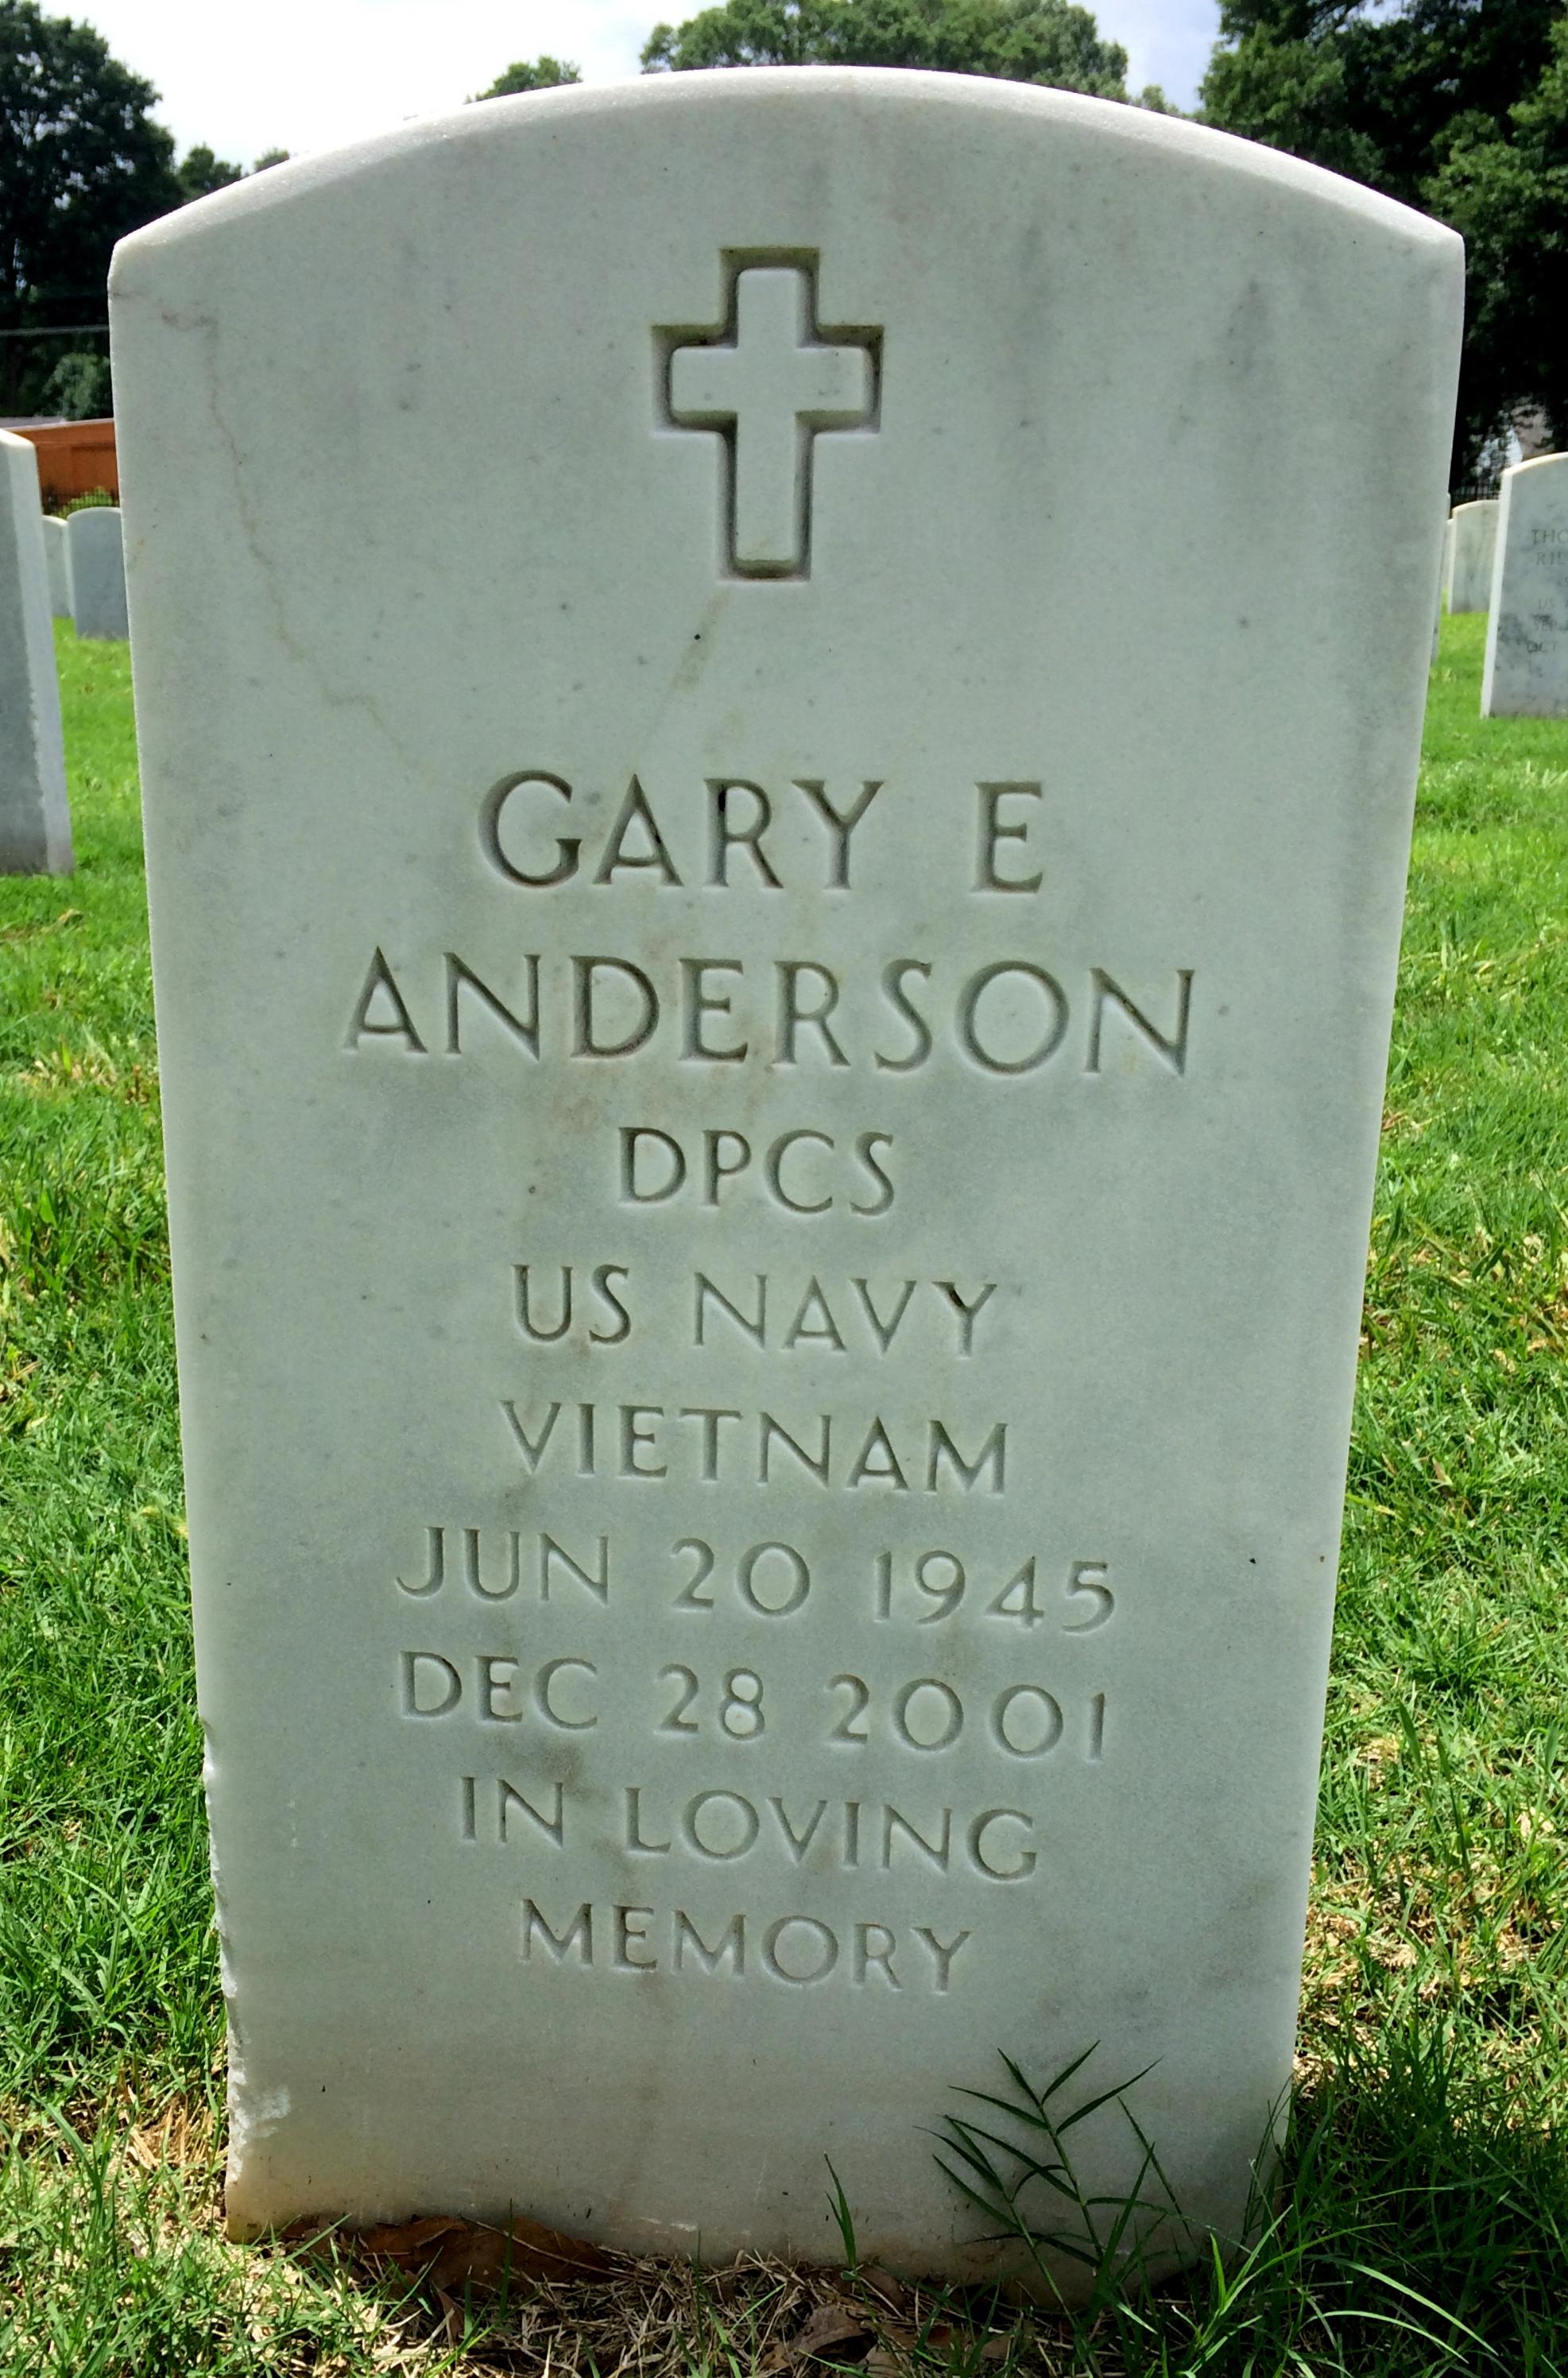 Gary E. Anderson